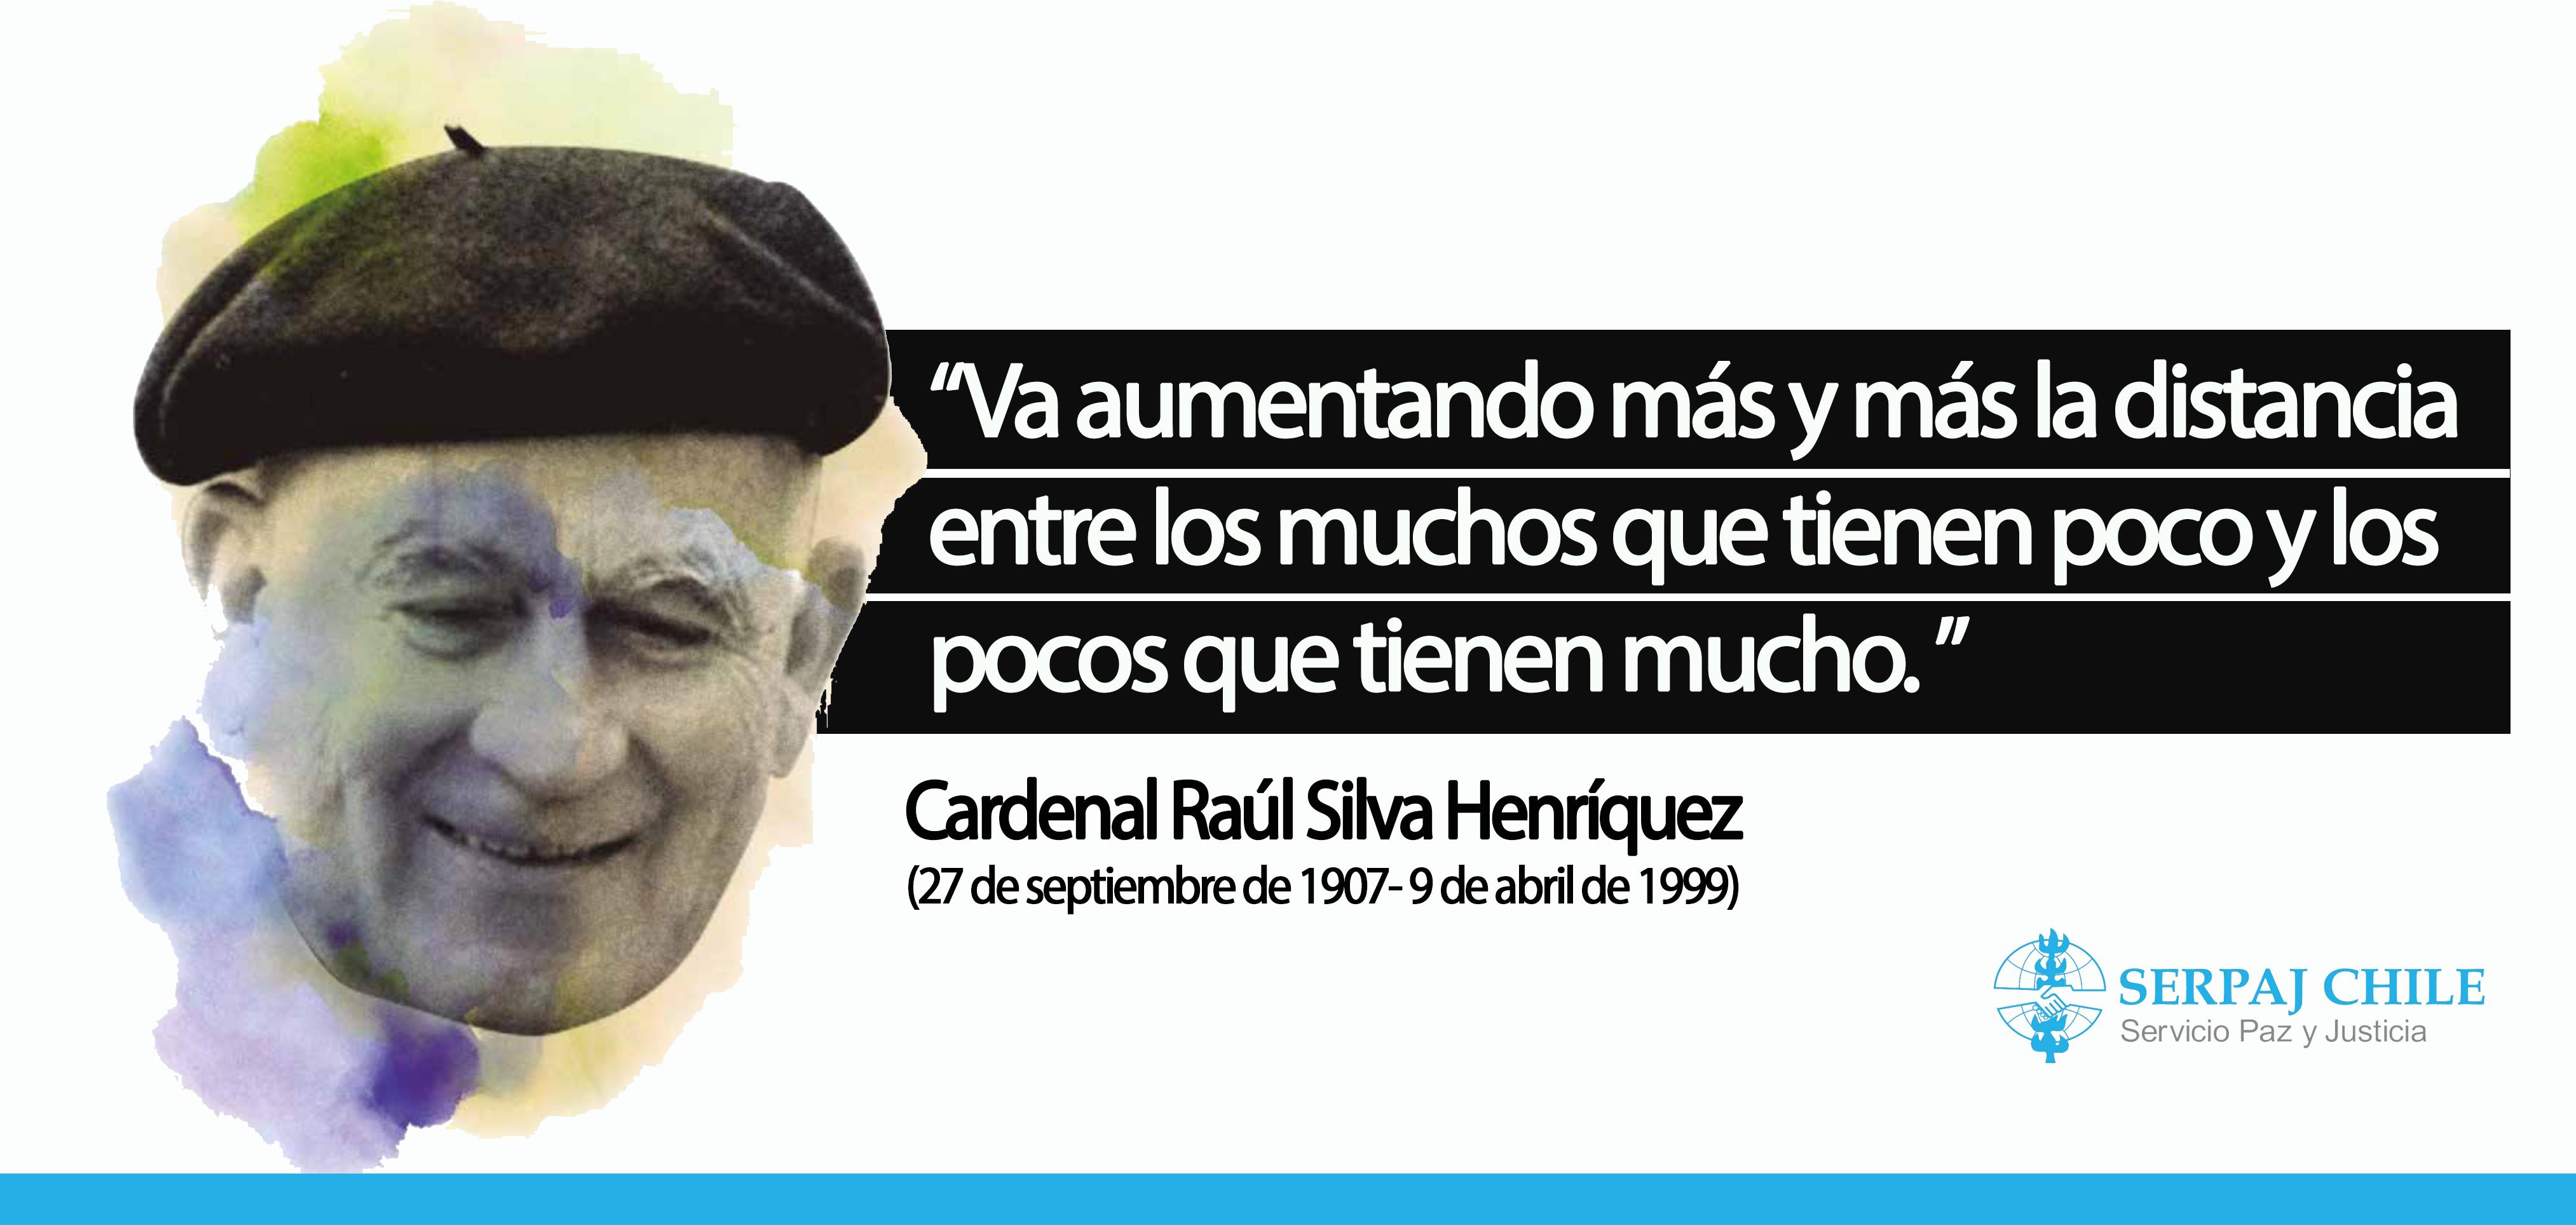 Silva Henríquez